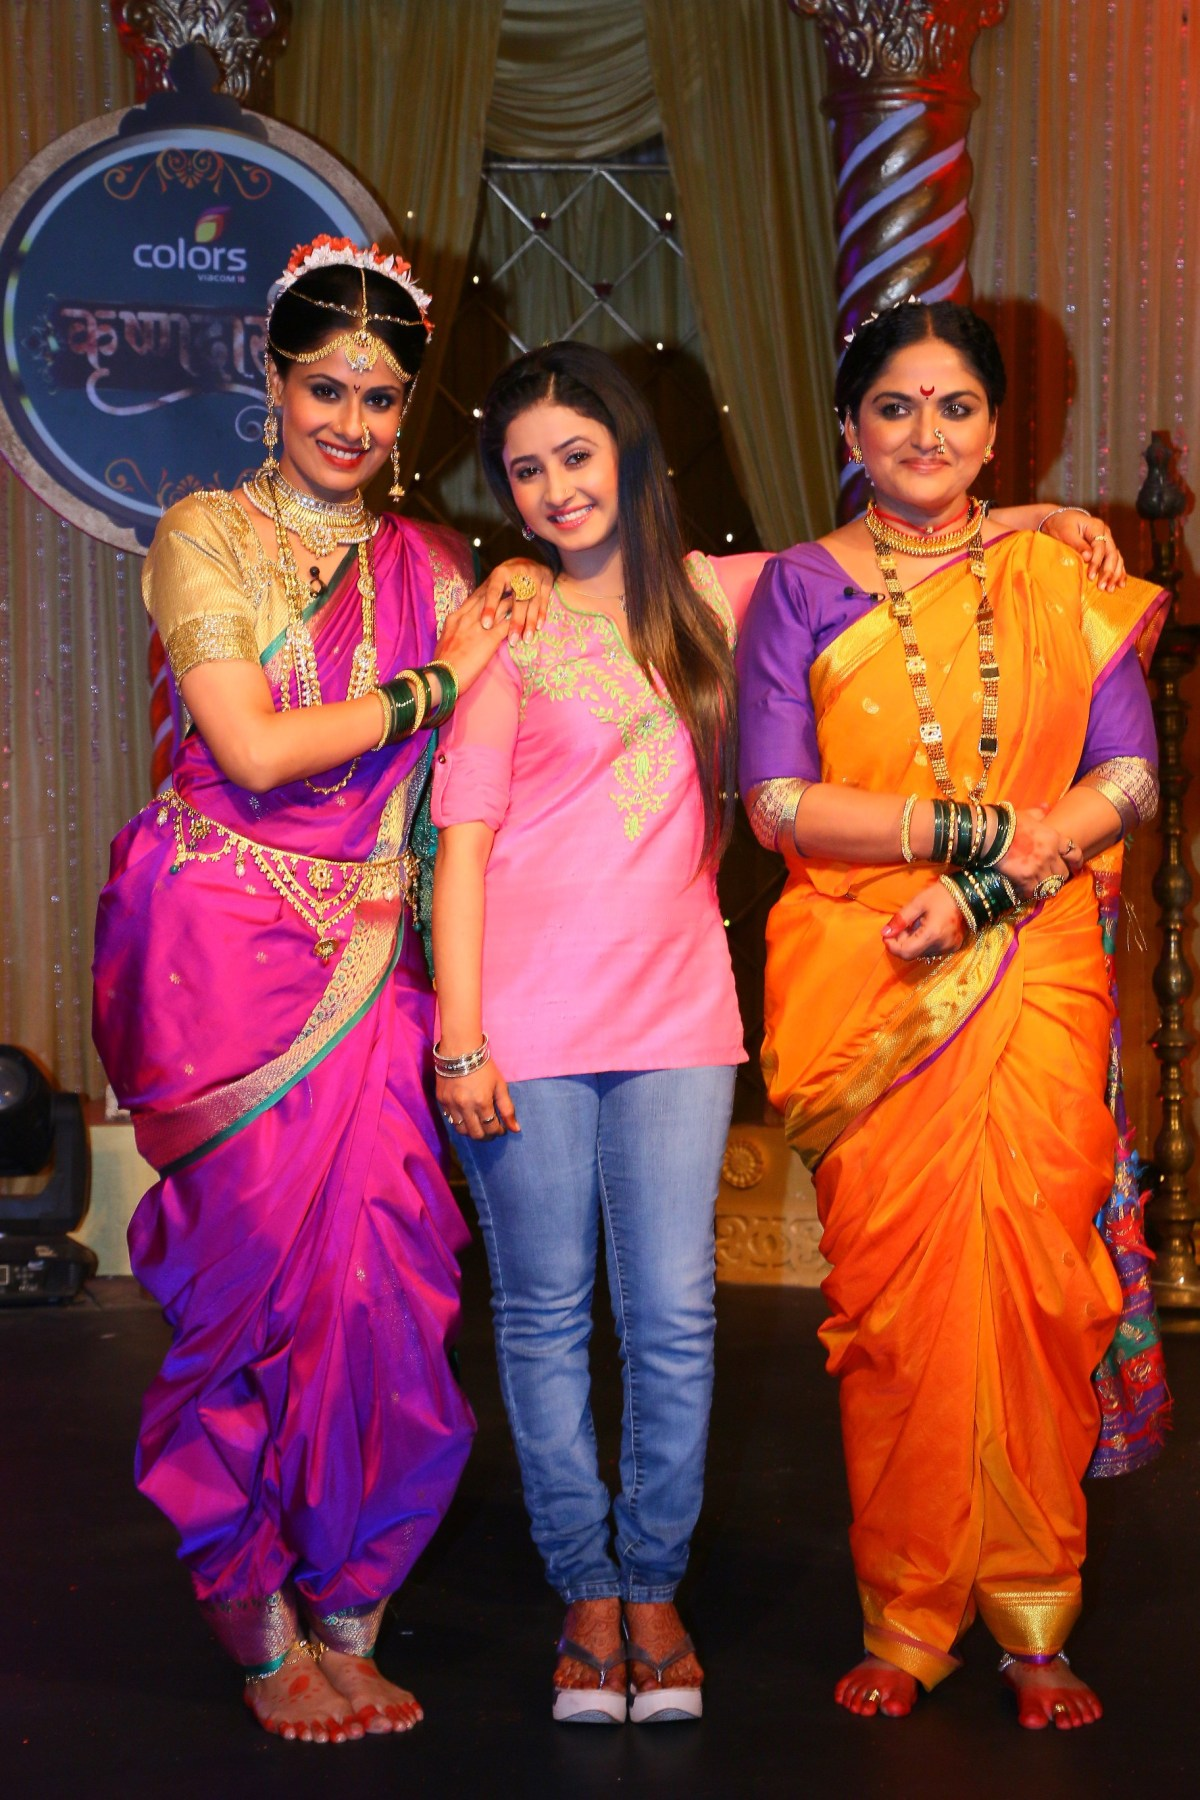 Chhavi Mittal as Tulsi, Sana Sheikh as Aradhya and Indira Krishnan as Kumudini perform at COLORS' Krishndasi launch